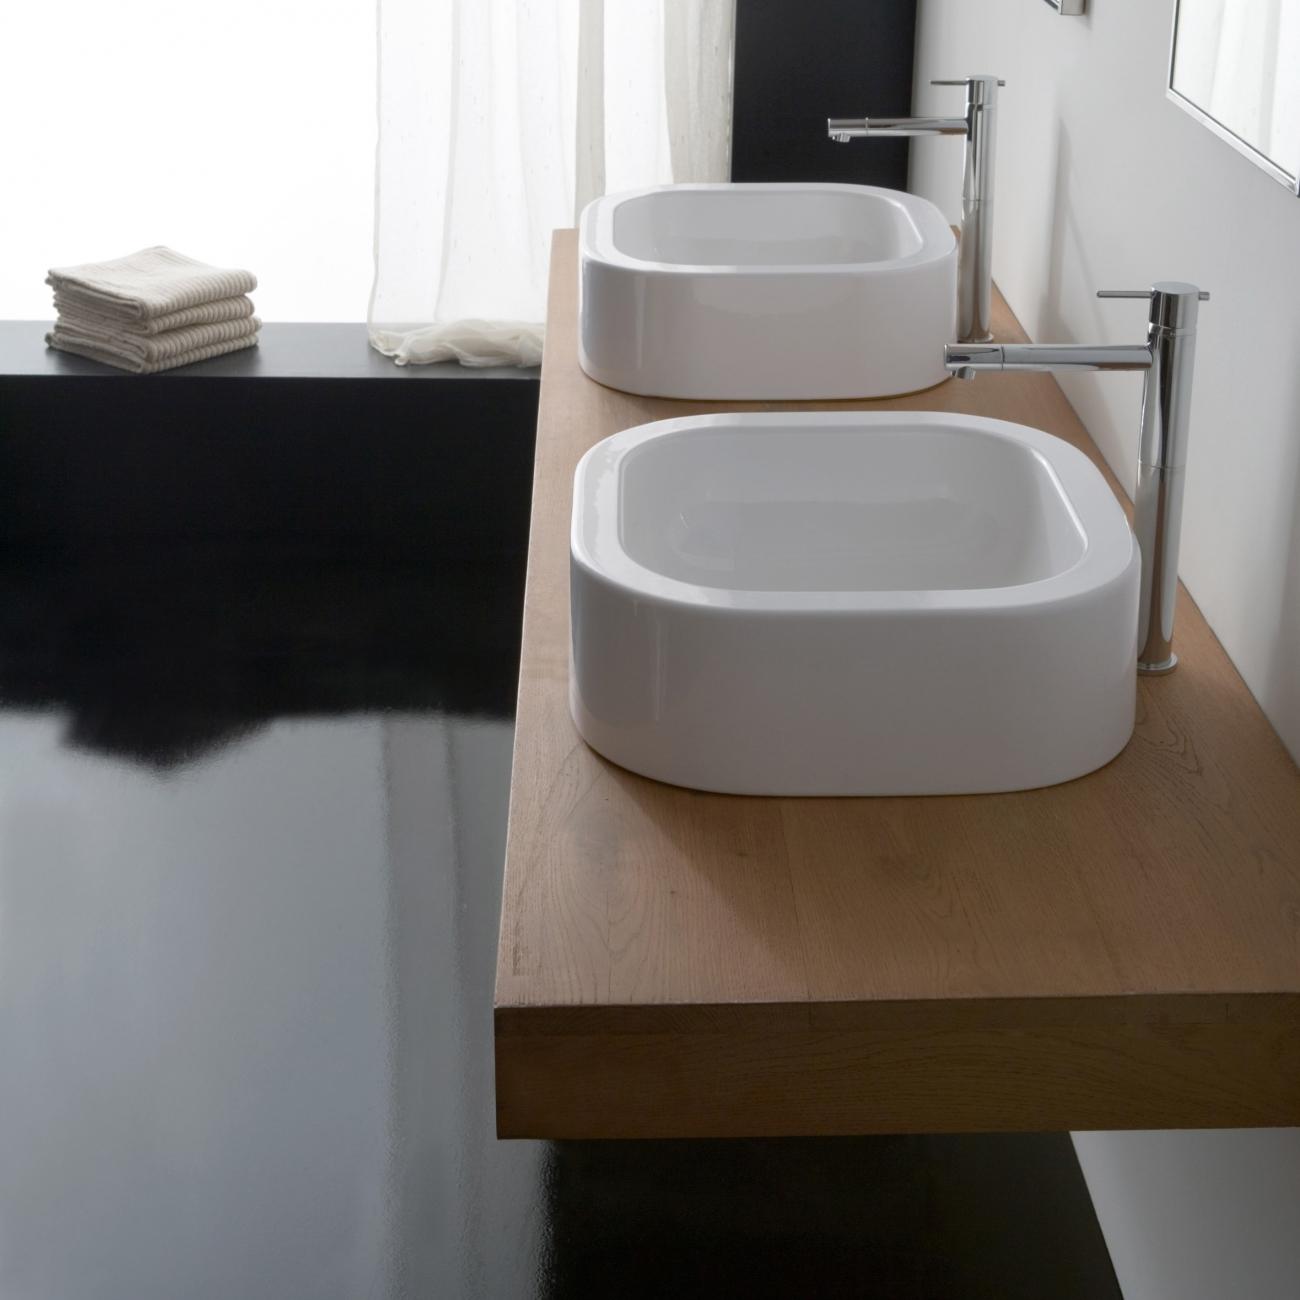 SCARABEO NEXT 40 Lay-on washbasin